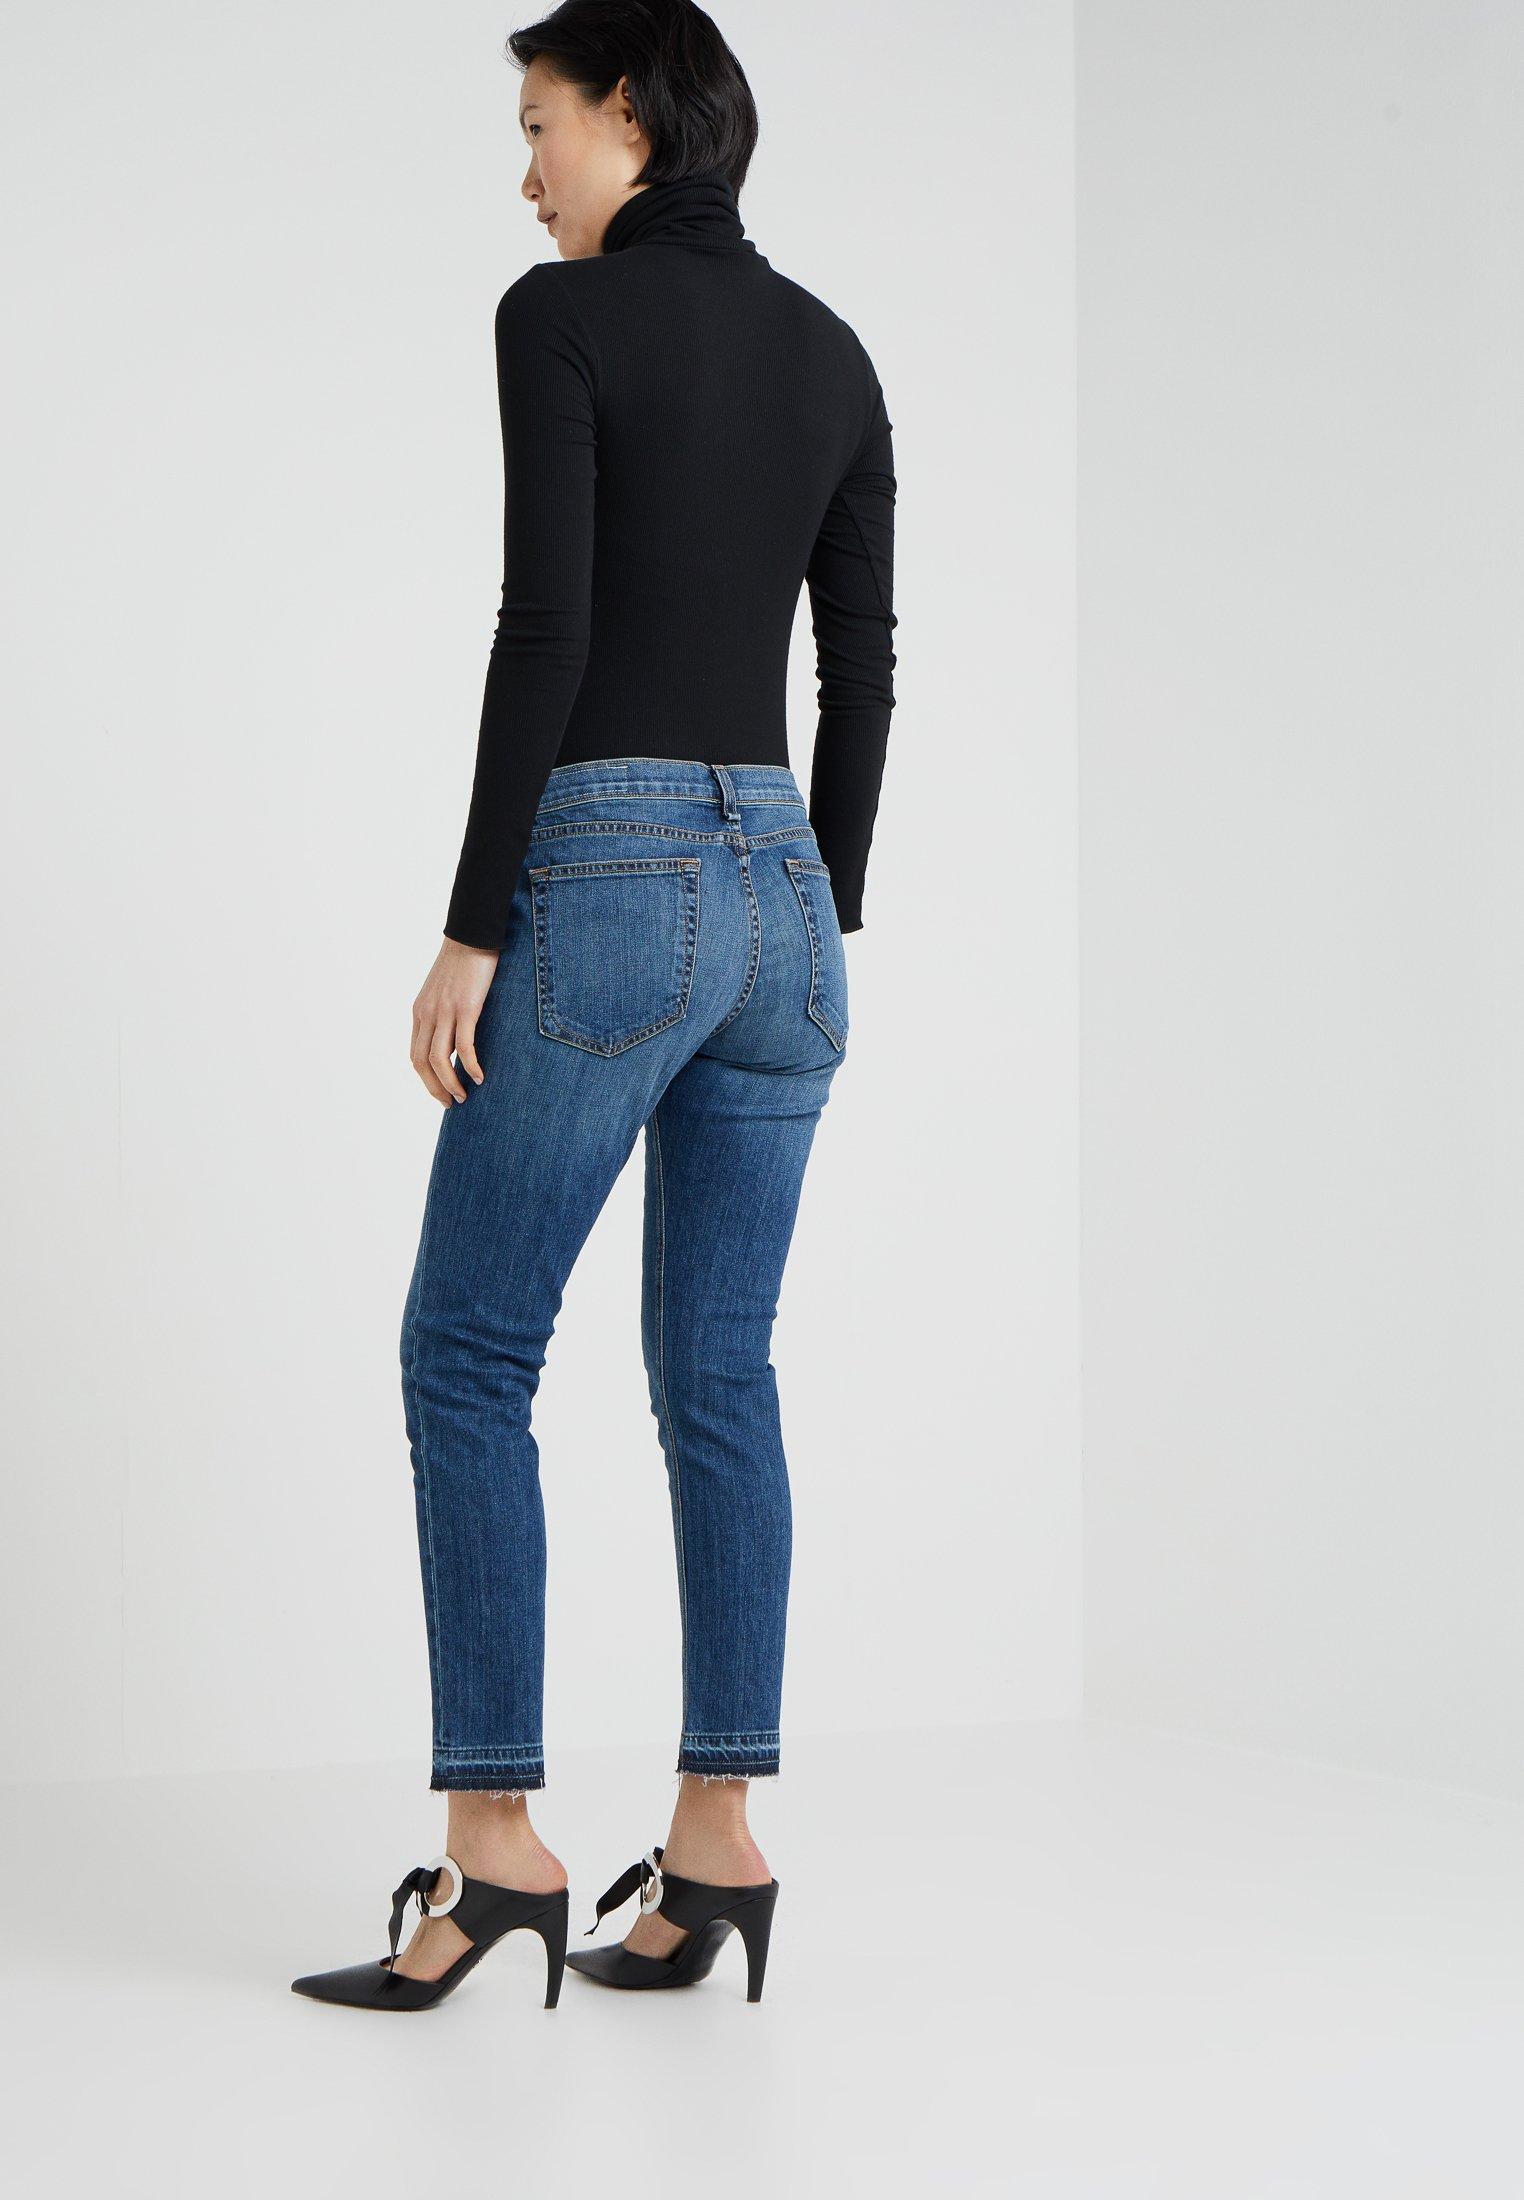 rag & bone Slim fit jeans - livingstone - Women's Clothing ATH9j